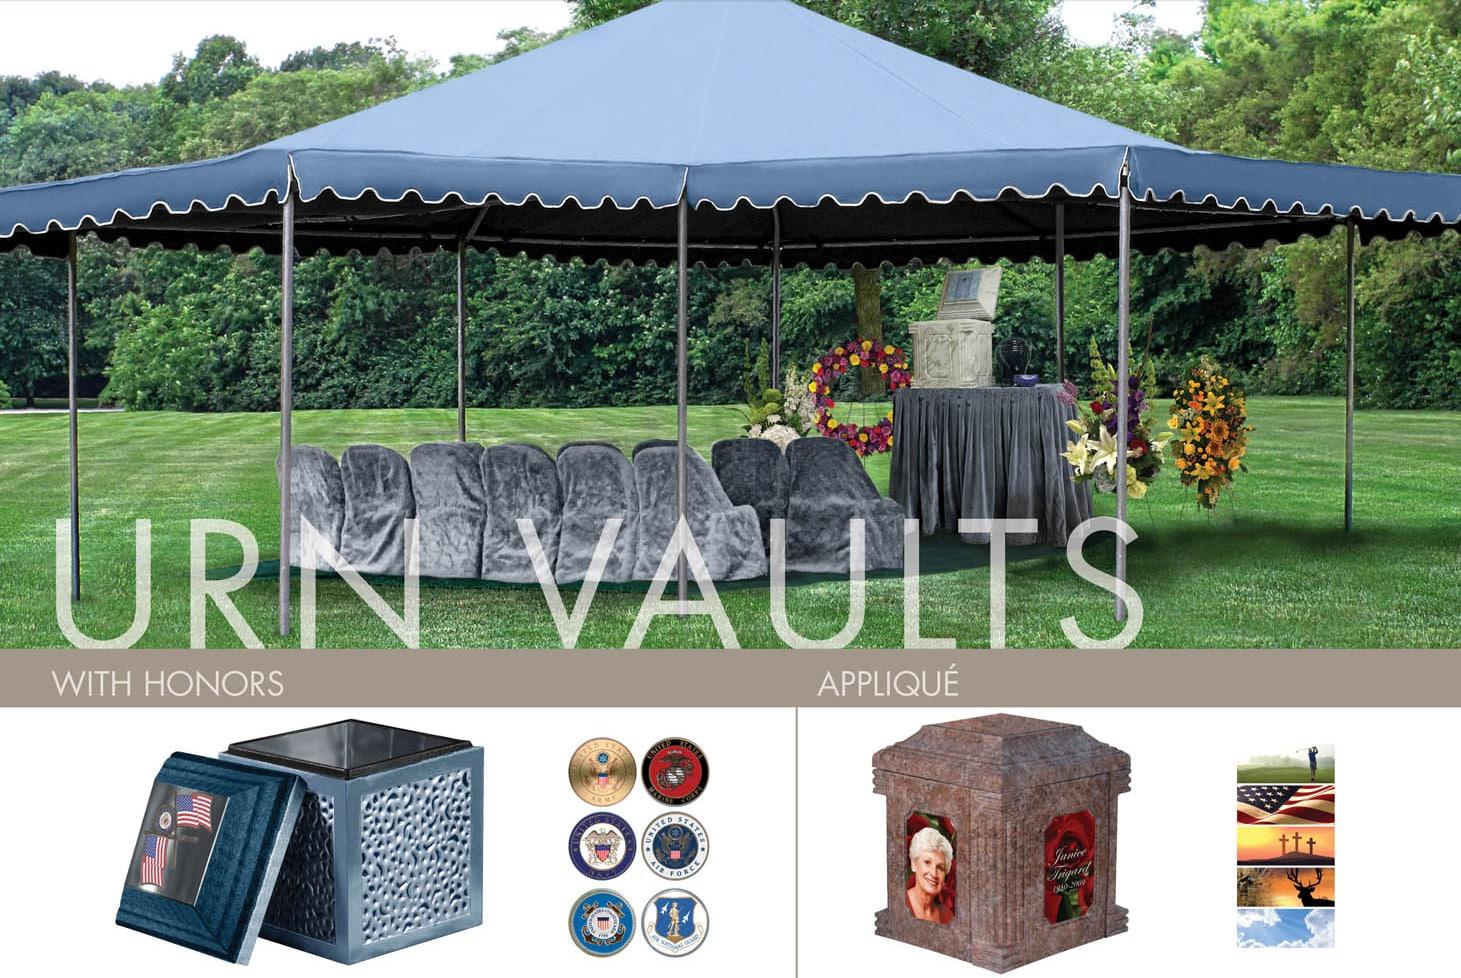 urn-vault-display